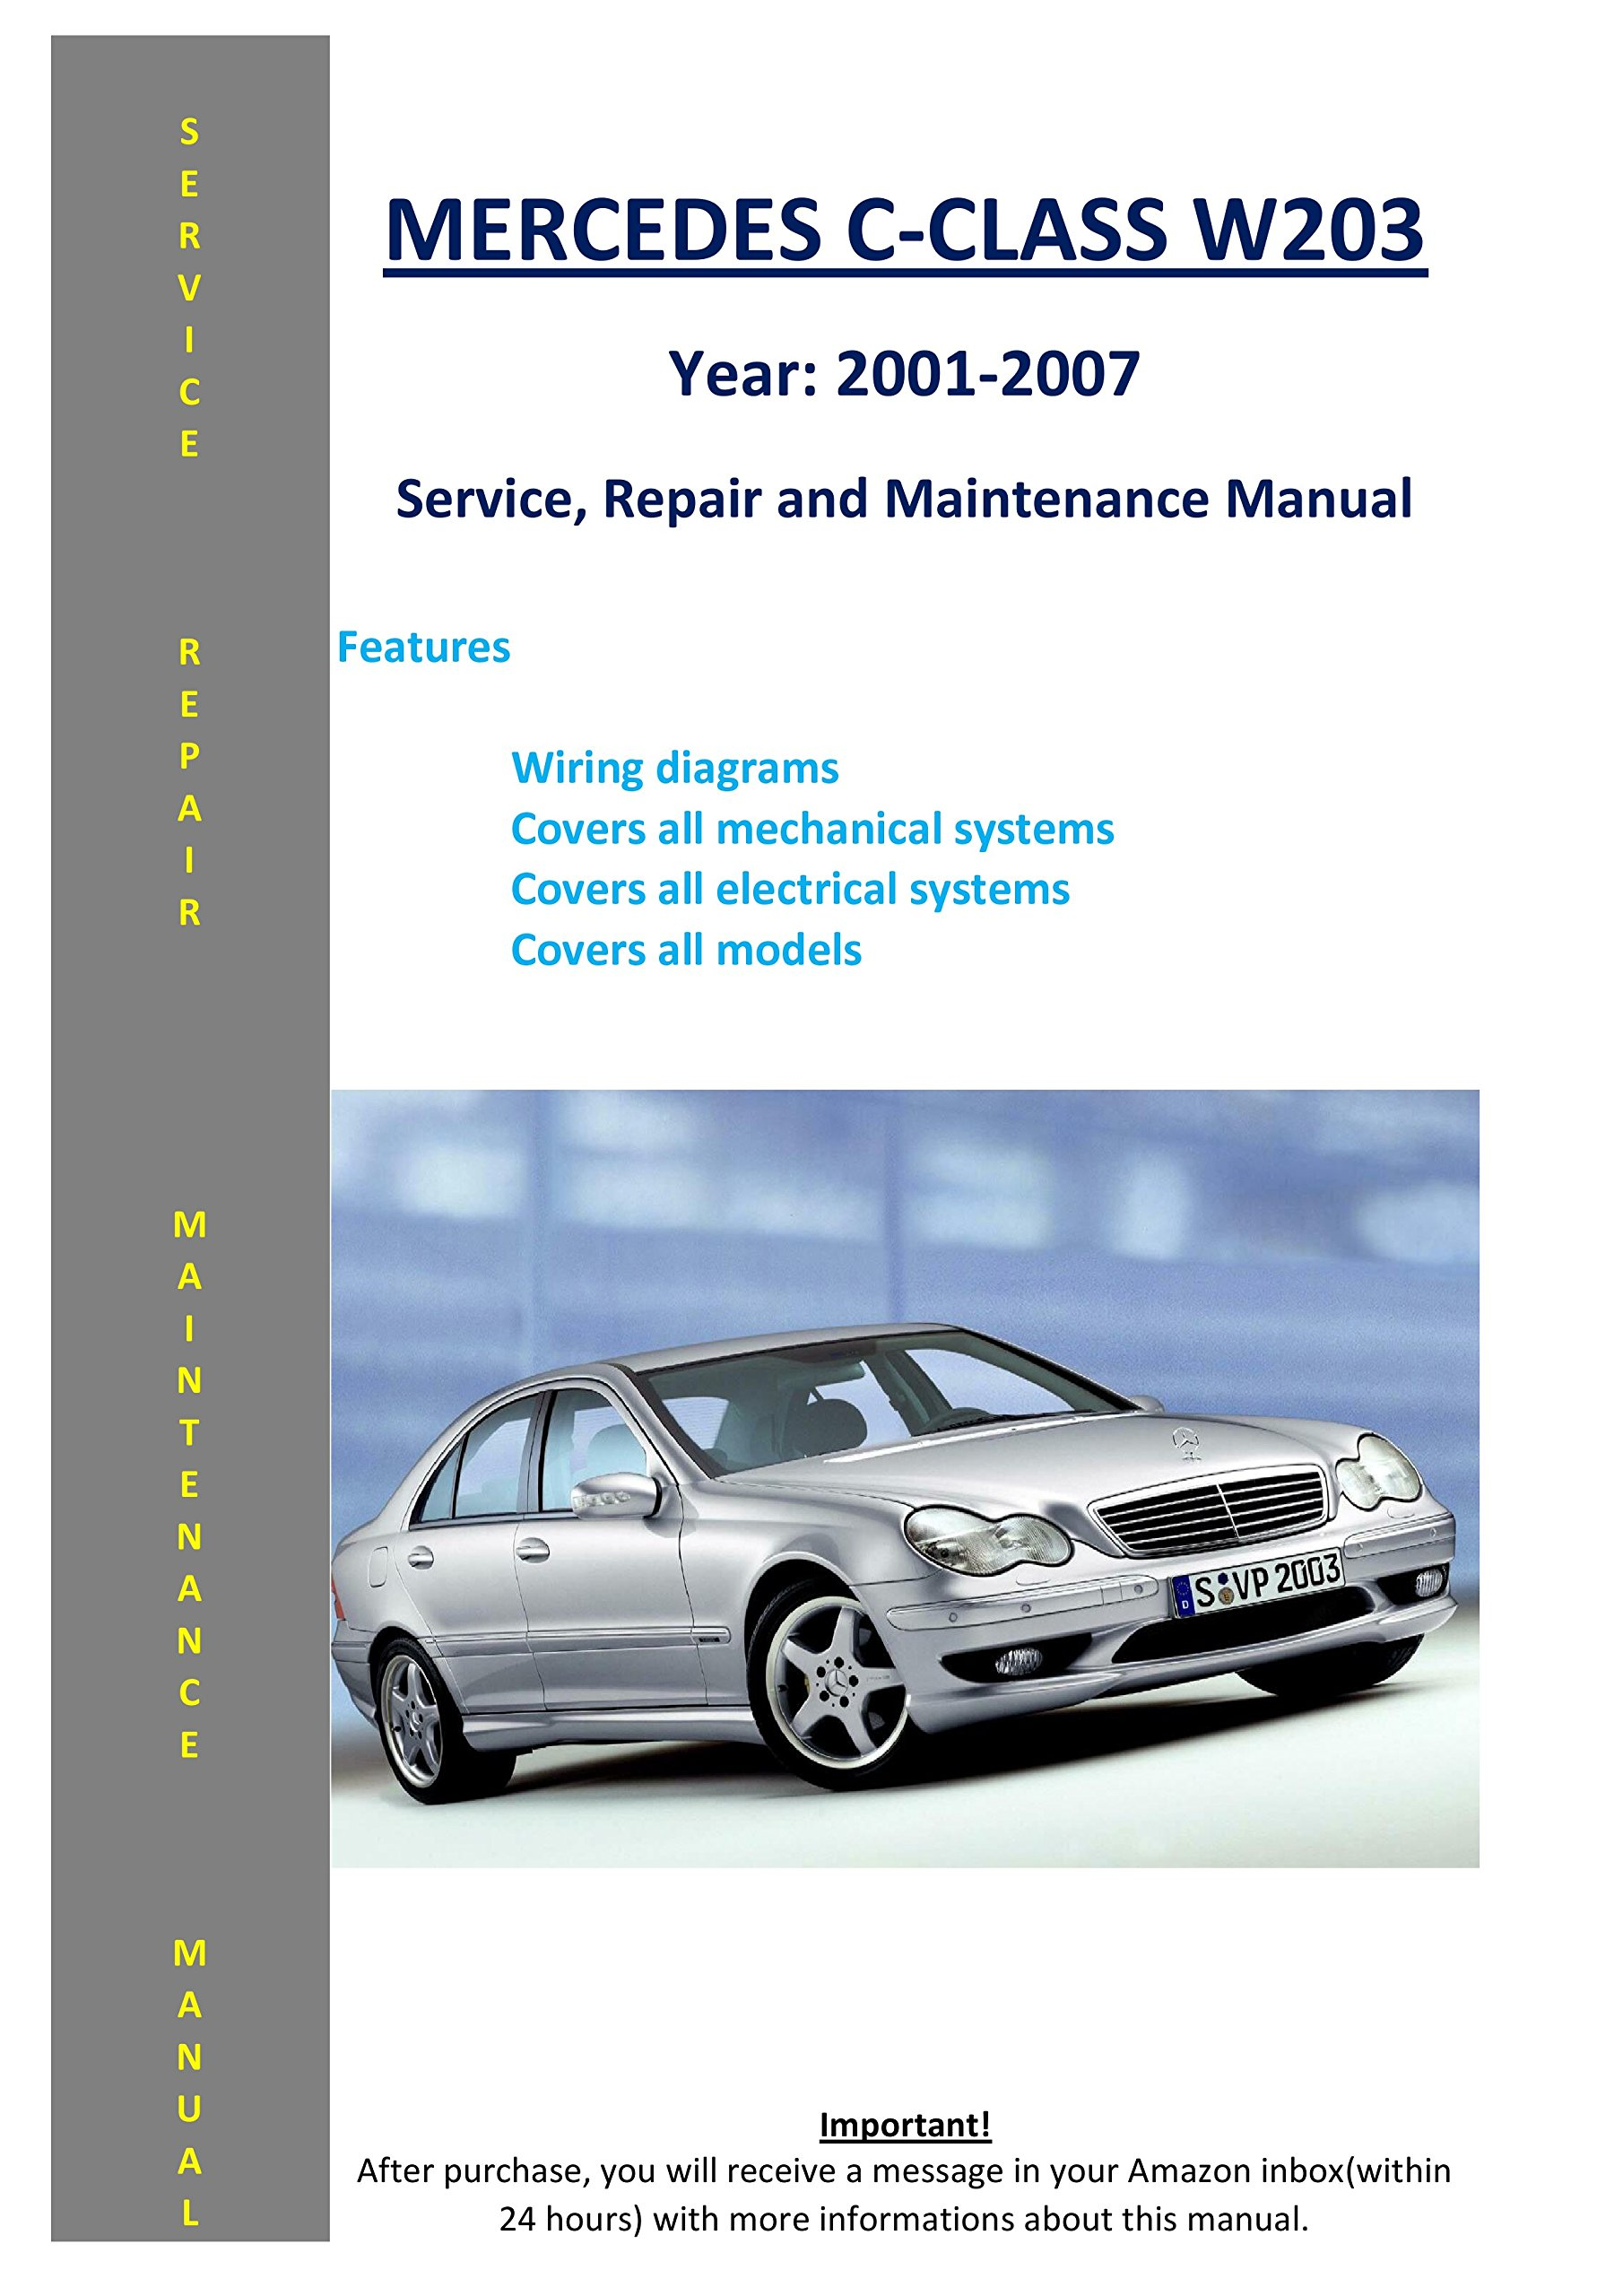 [QMVU_8575]  Mercedes-benz C-class W203 From 2001 - 2007 Service Repair Maintenance  Manual: SoftAuto Manuals: 5858006536925: Amazon.com: Books   Mercedes Benz C Class Wiring Diagrams      Amazon.com